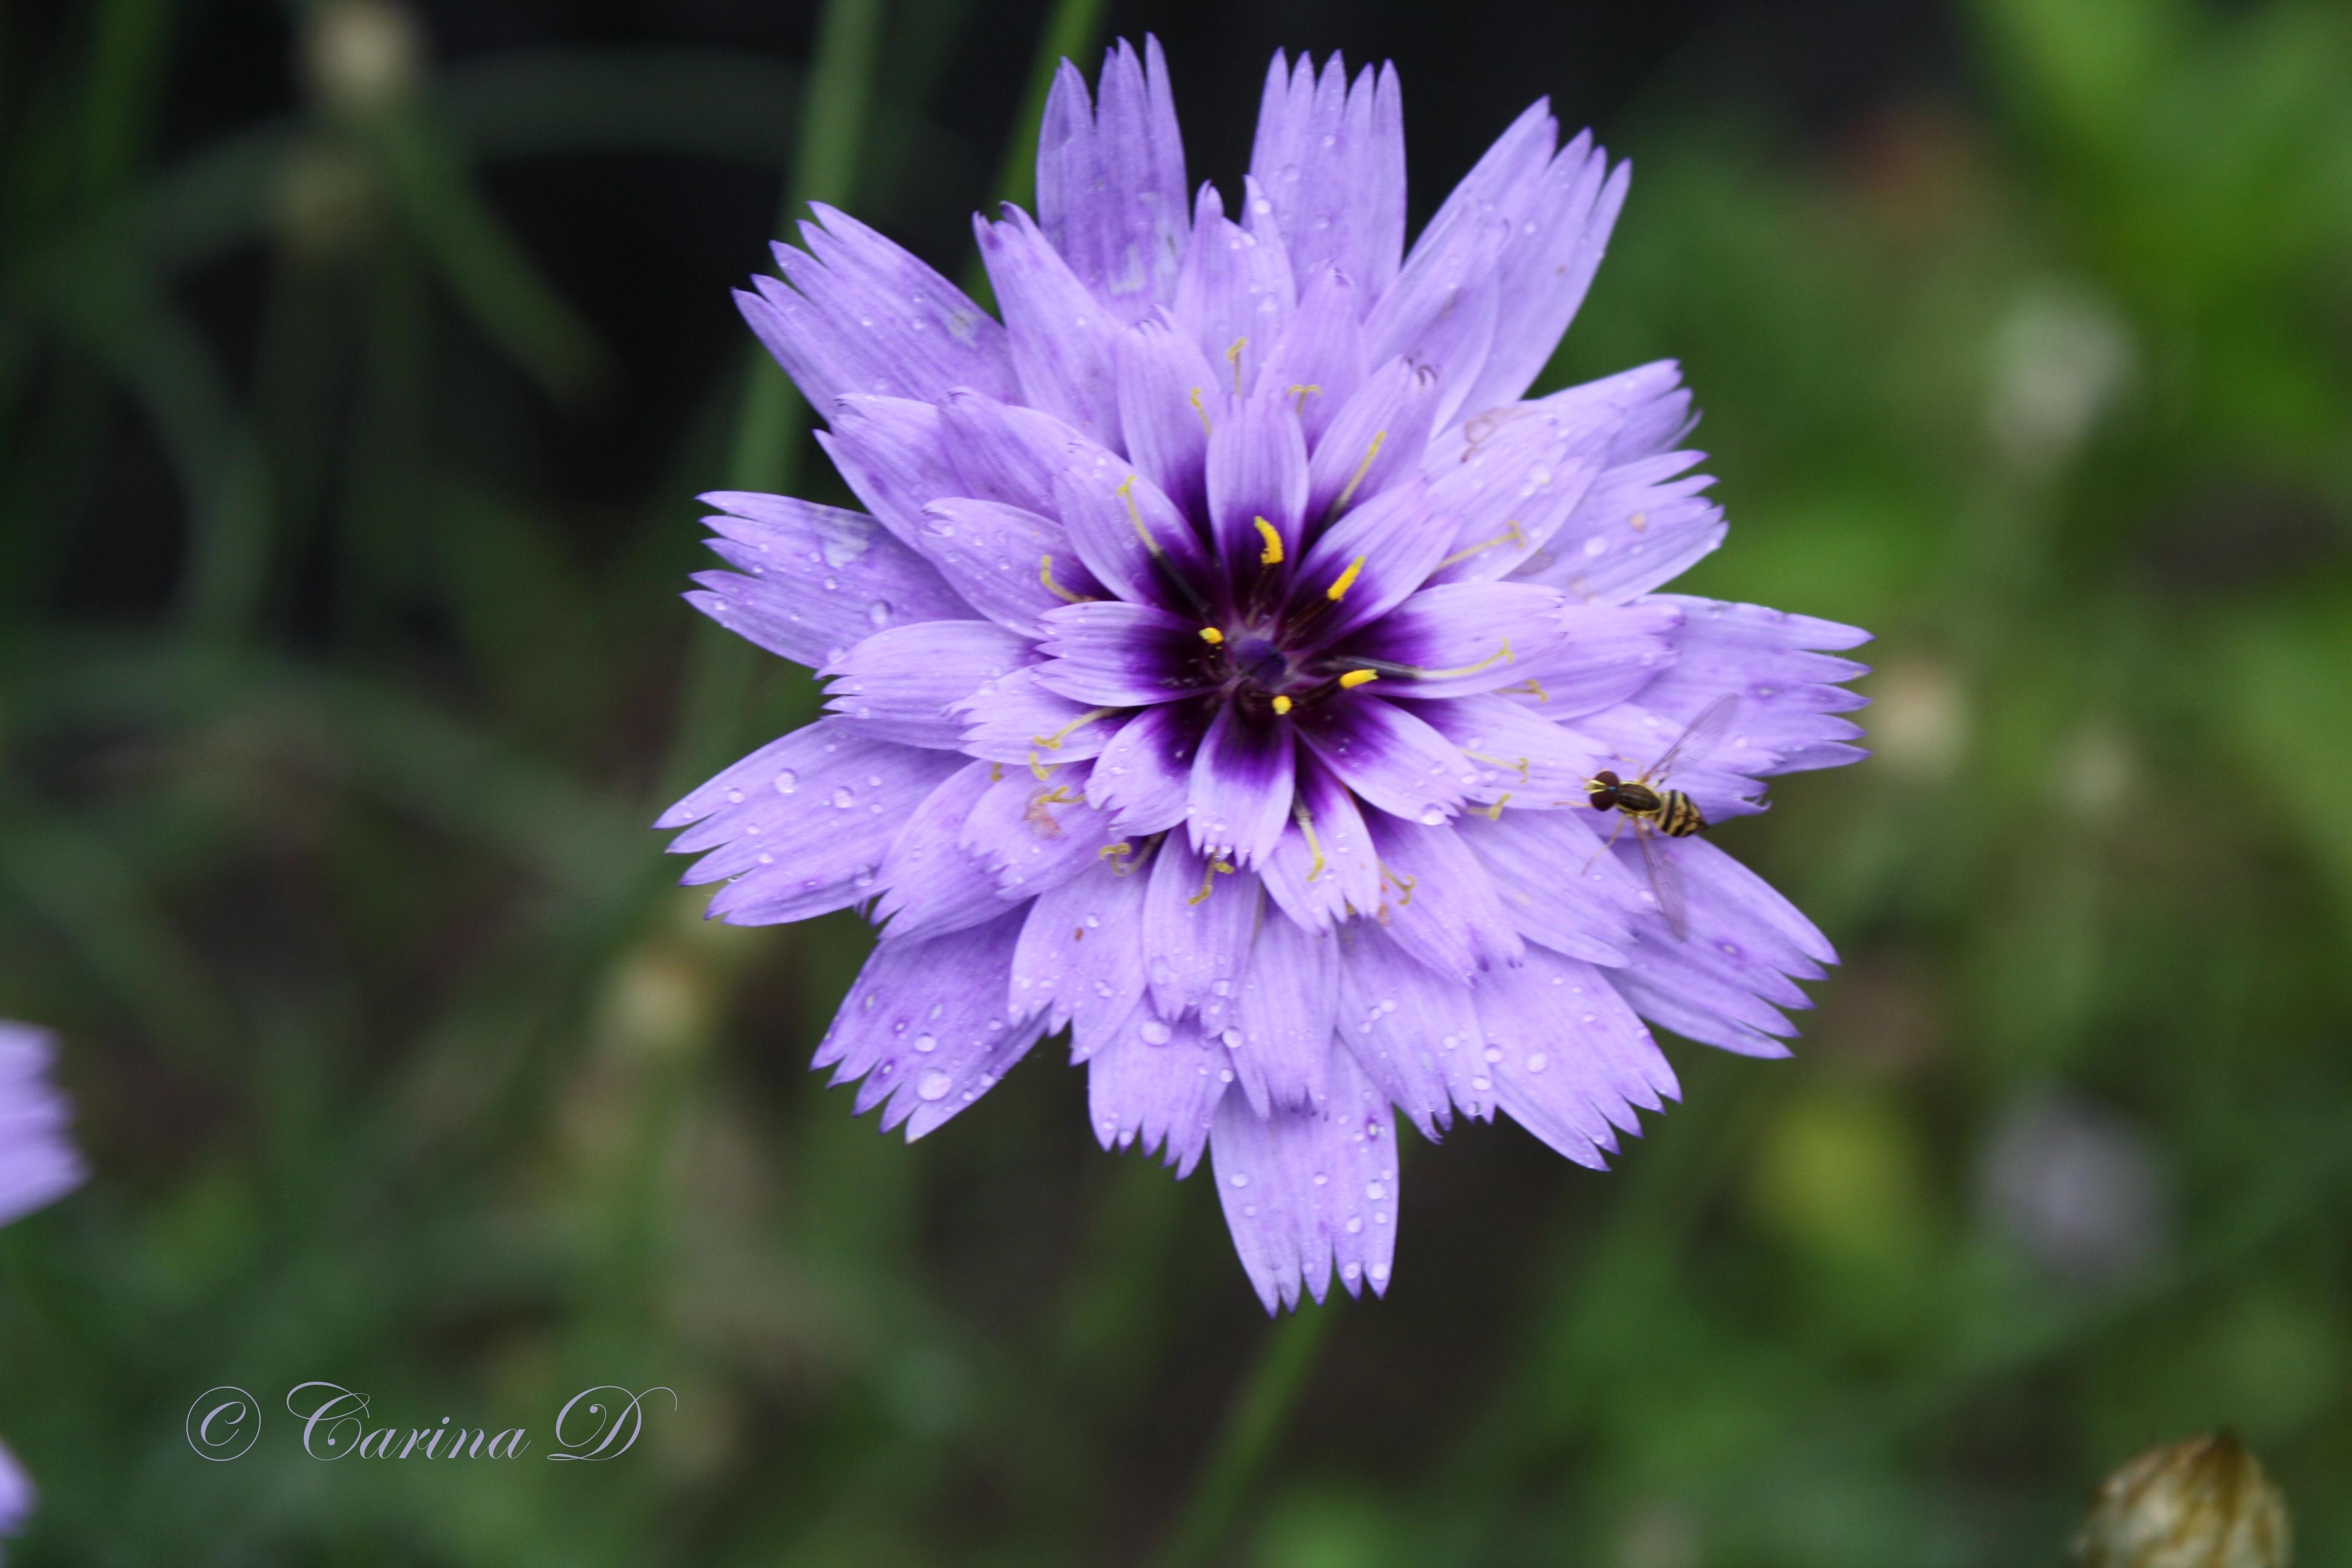 Perennials auntie dogmas garden spot strawflowersinrain230june2015 004 mightylinksfo